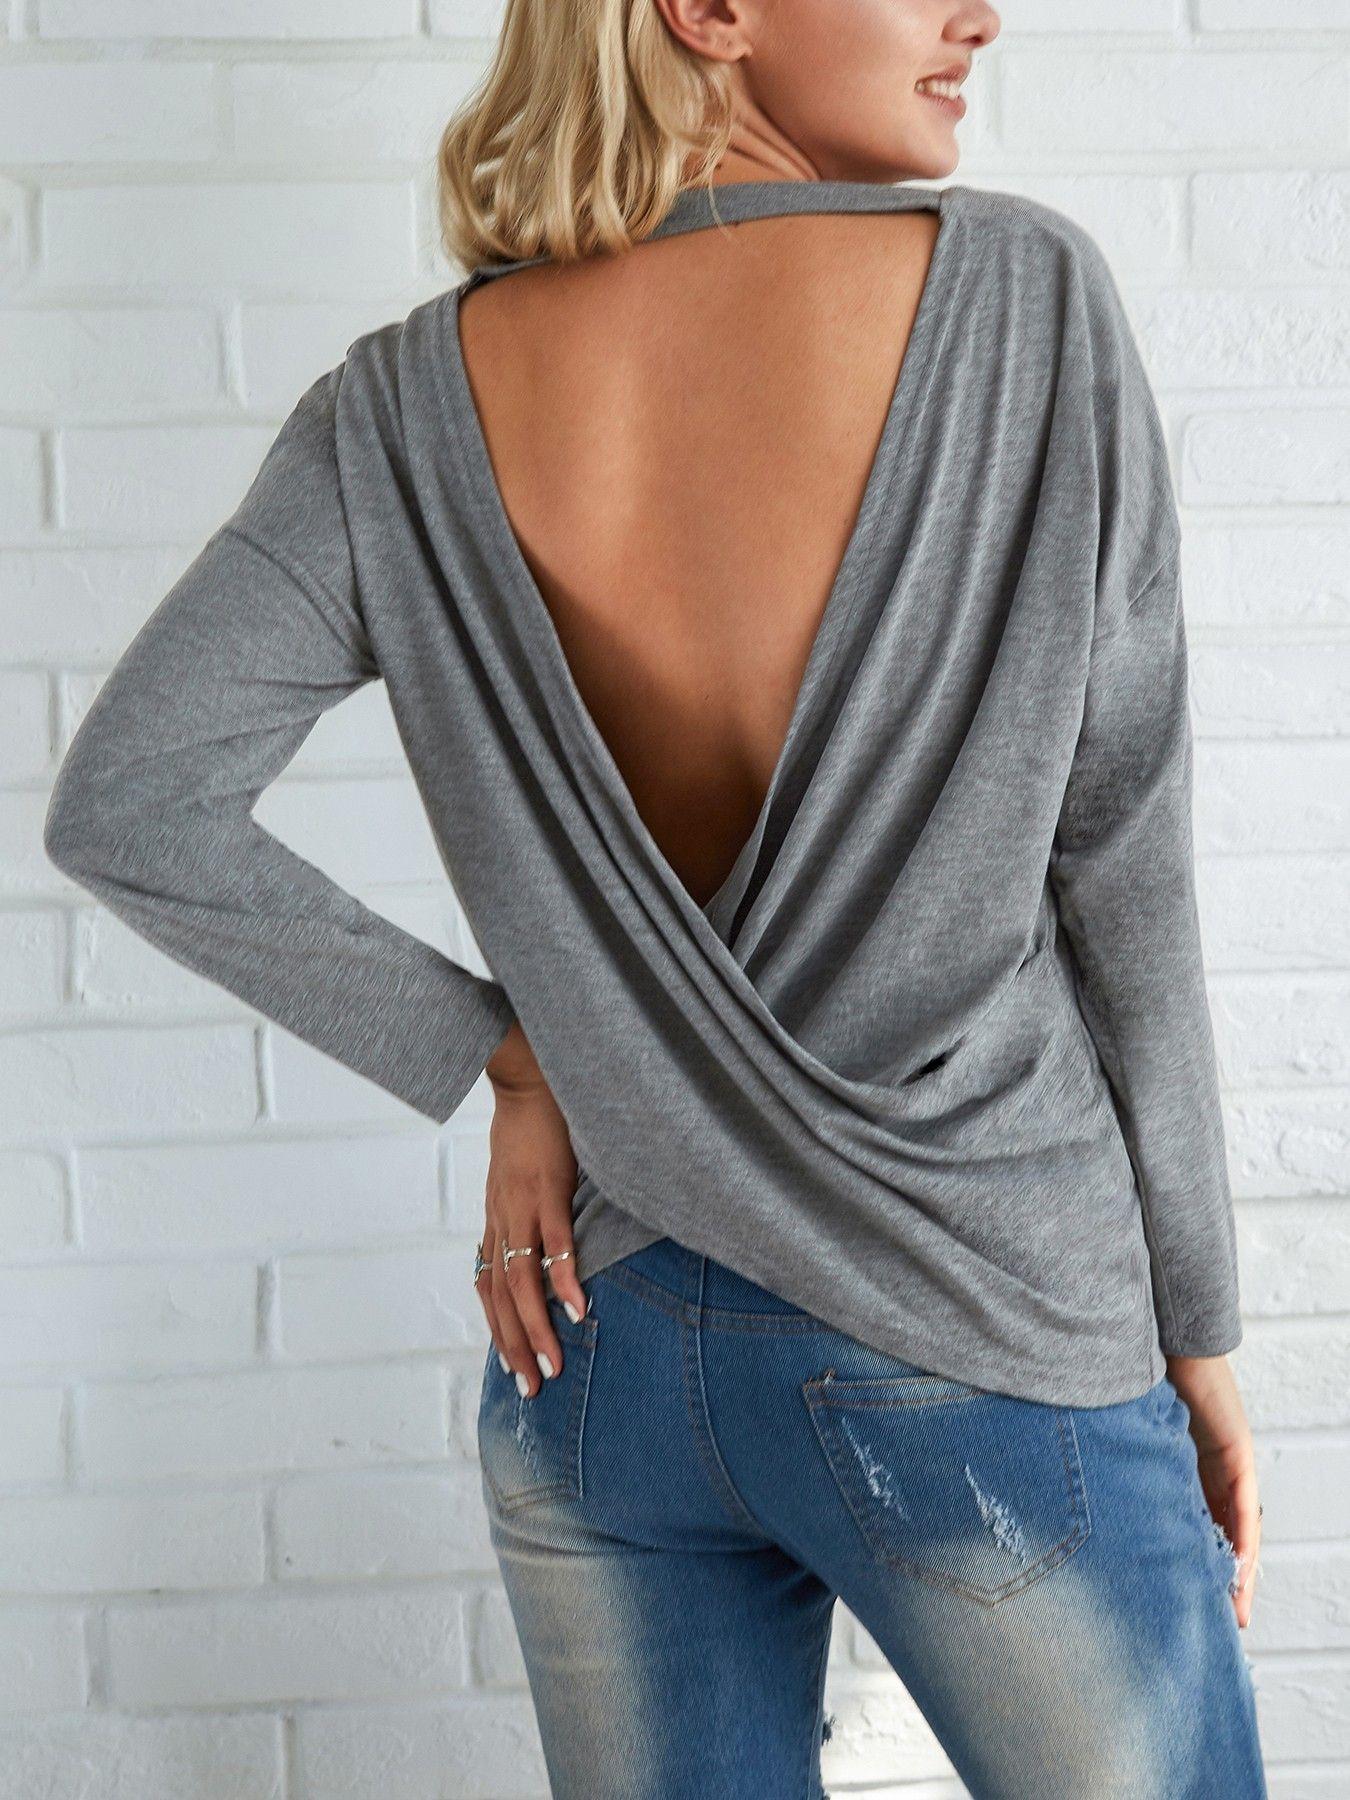 Fashion Open Back Crisscross Loose T Shirts Plus Size Outfits Fashion Women